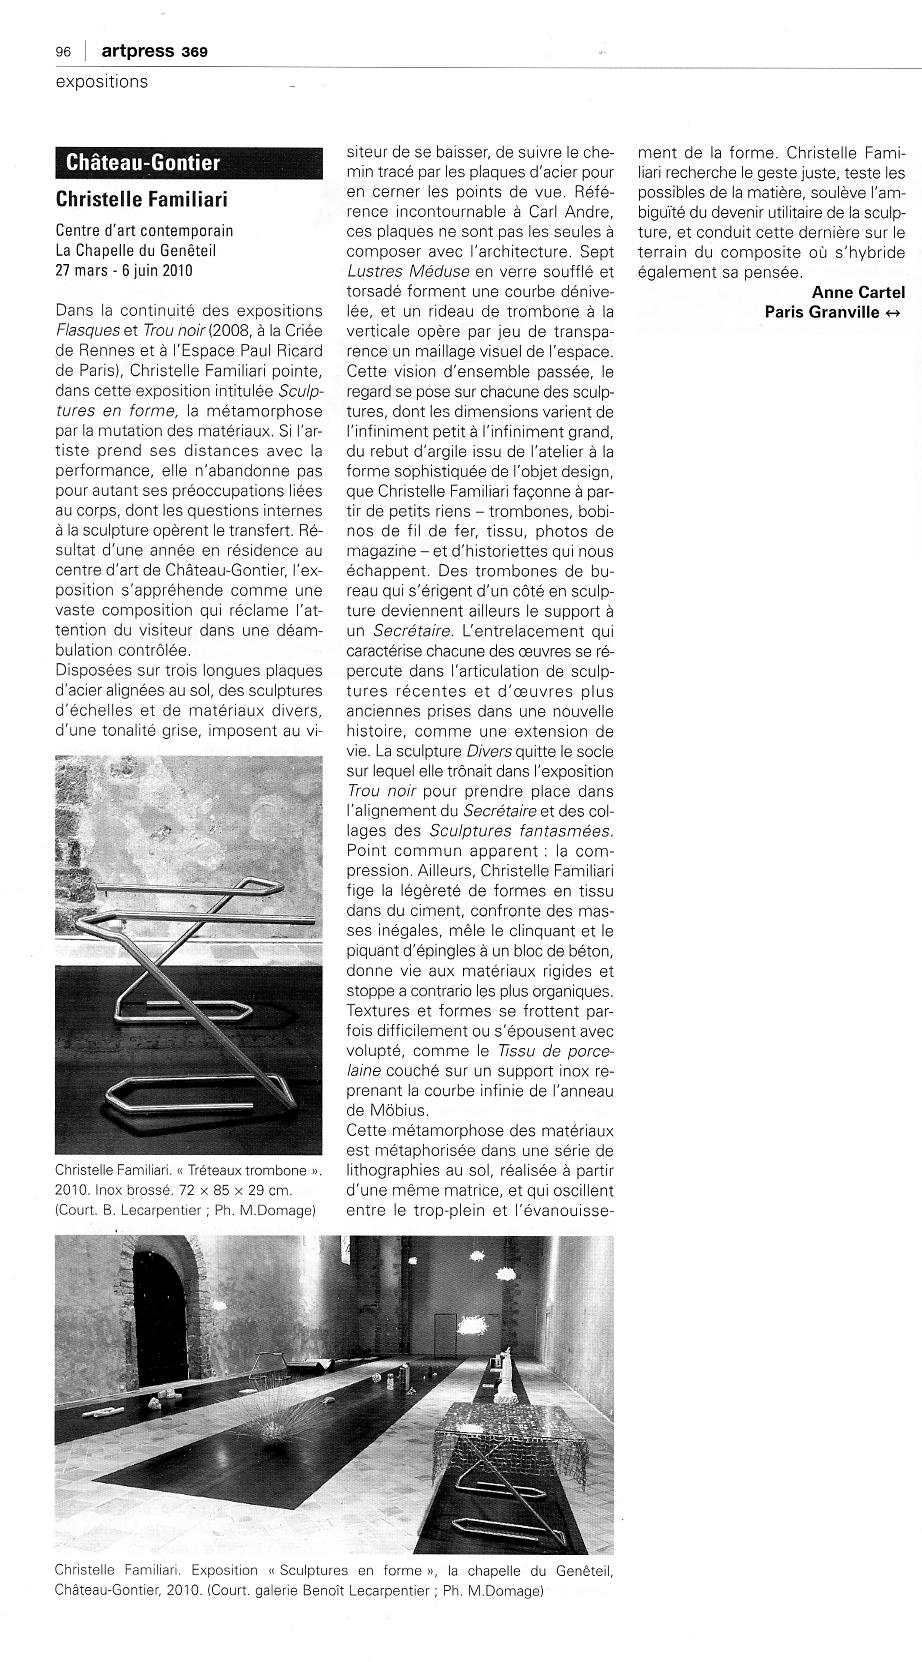 Sculptures en forme, anne cartel, artpress n°369, juillet-août 2010